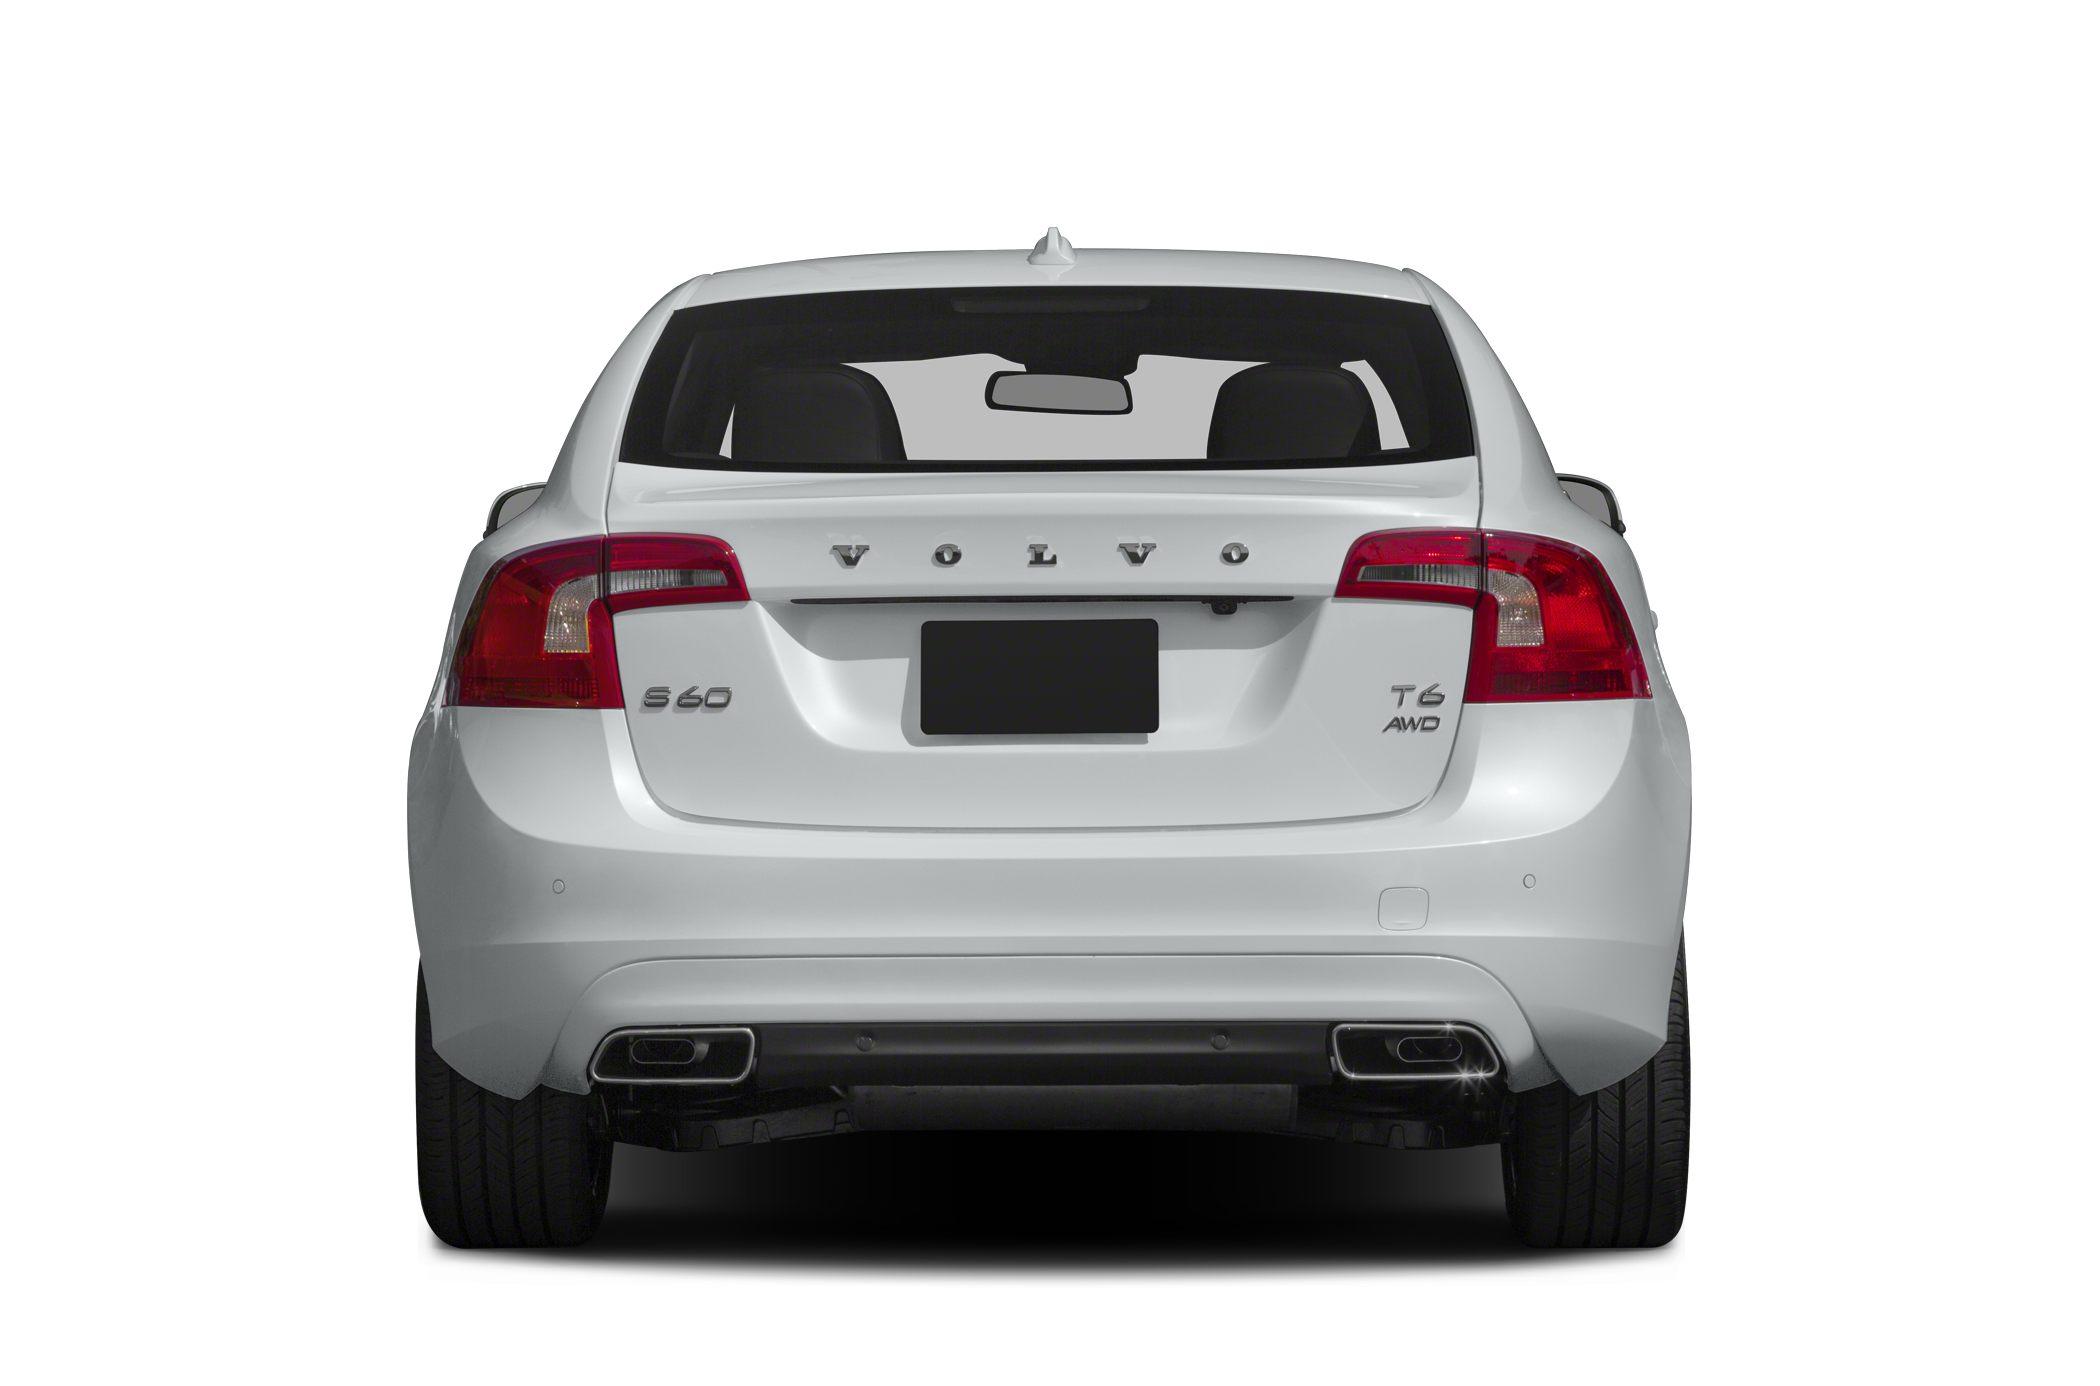 2015 5 volvo s60 t5 premier 4dr front wheel drive sedan pictures. Black Bedroom Furniture Sets. Home Design Ideas